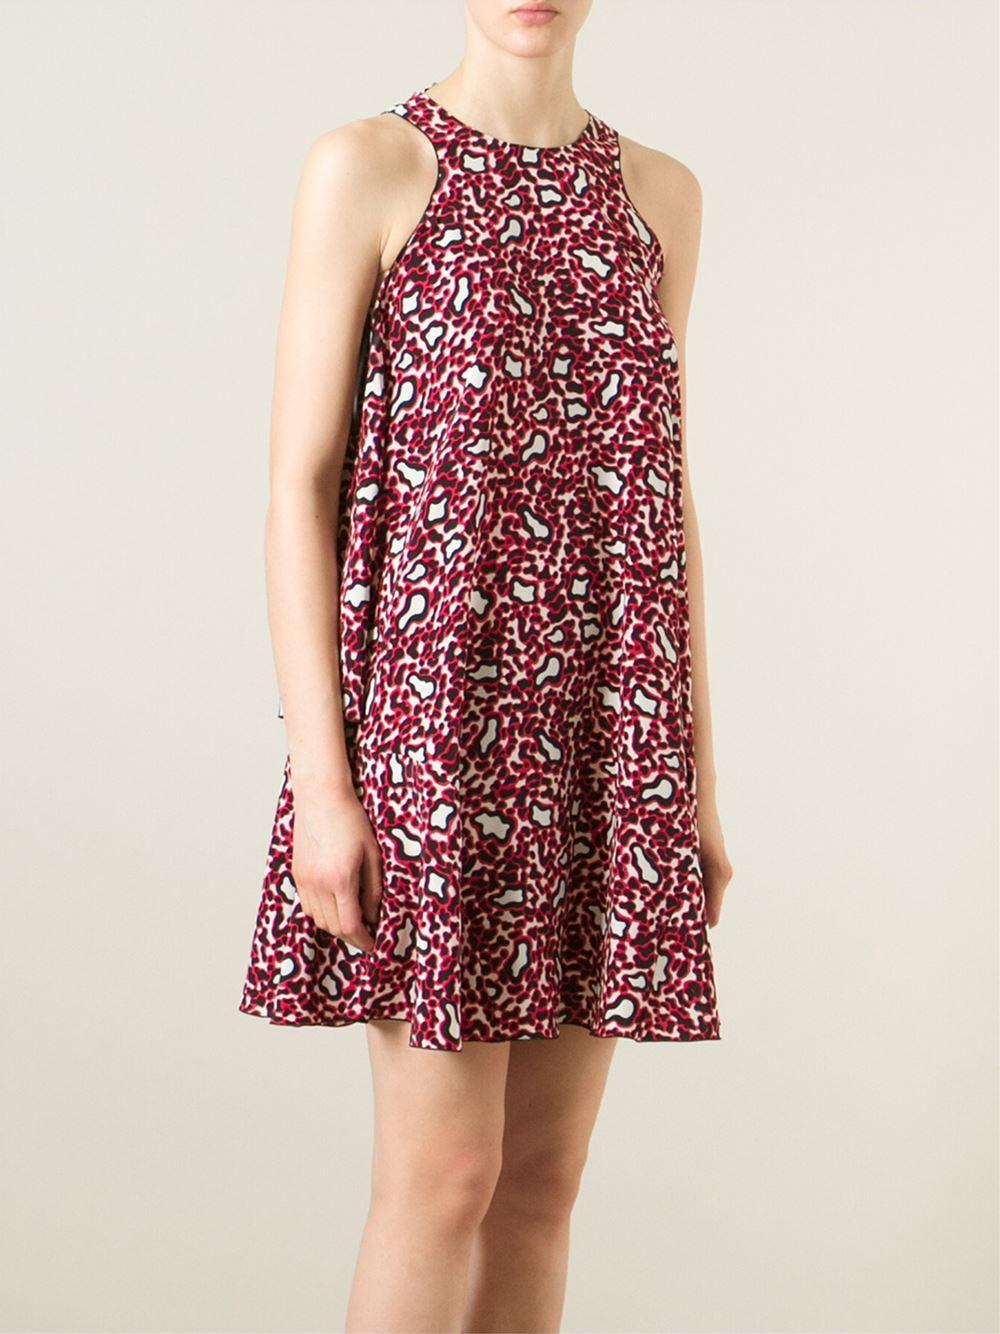 Stella clothing online